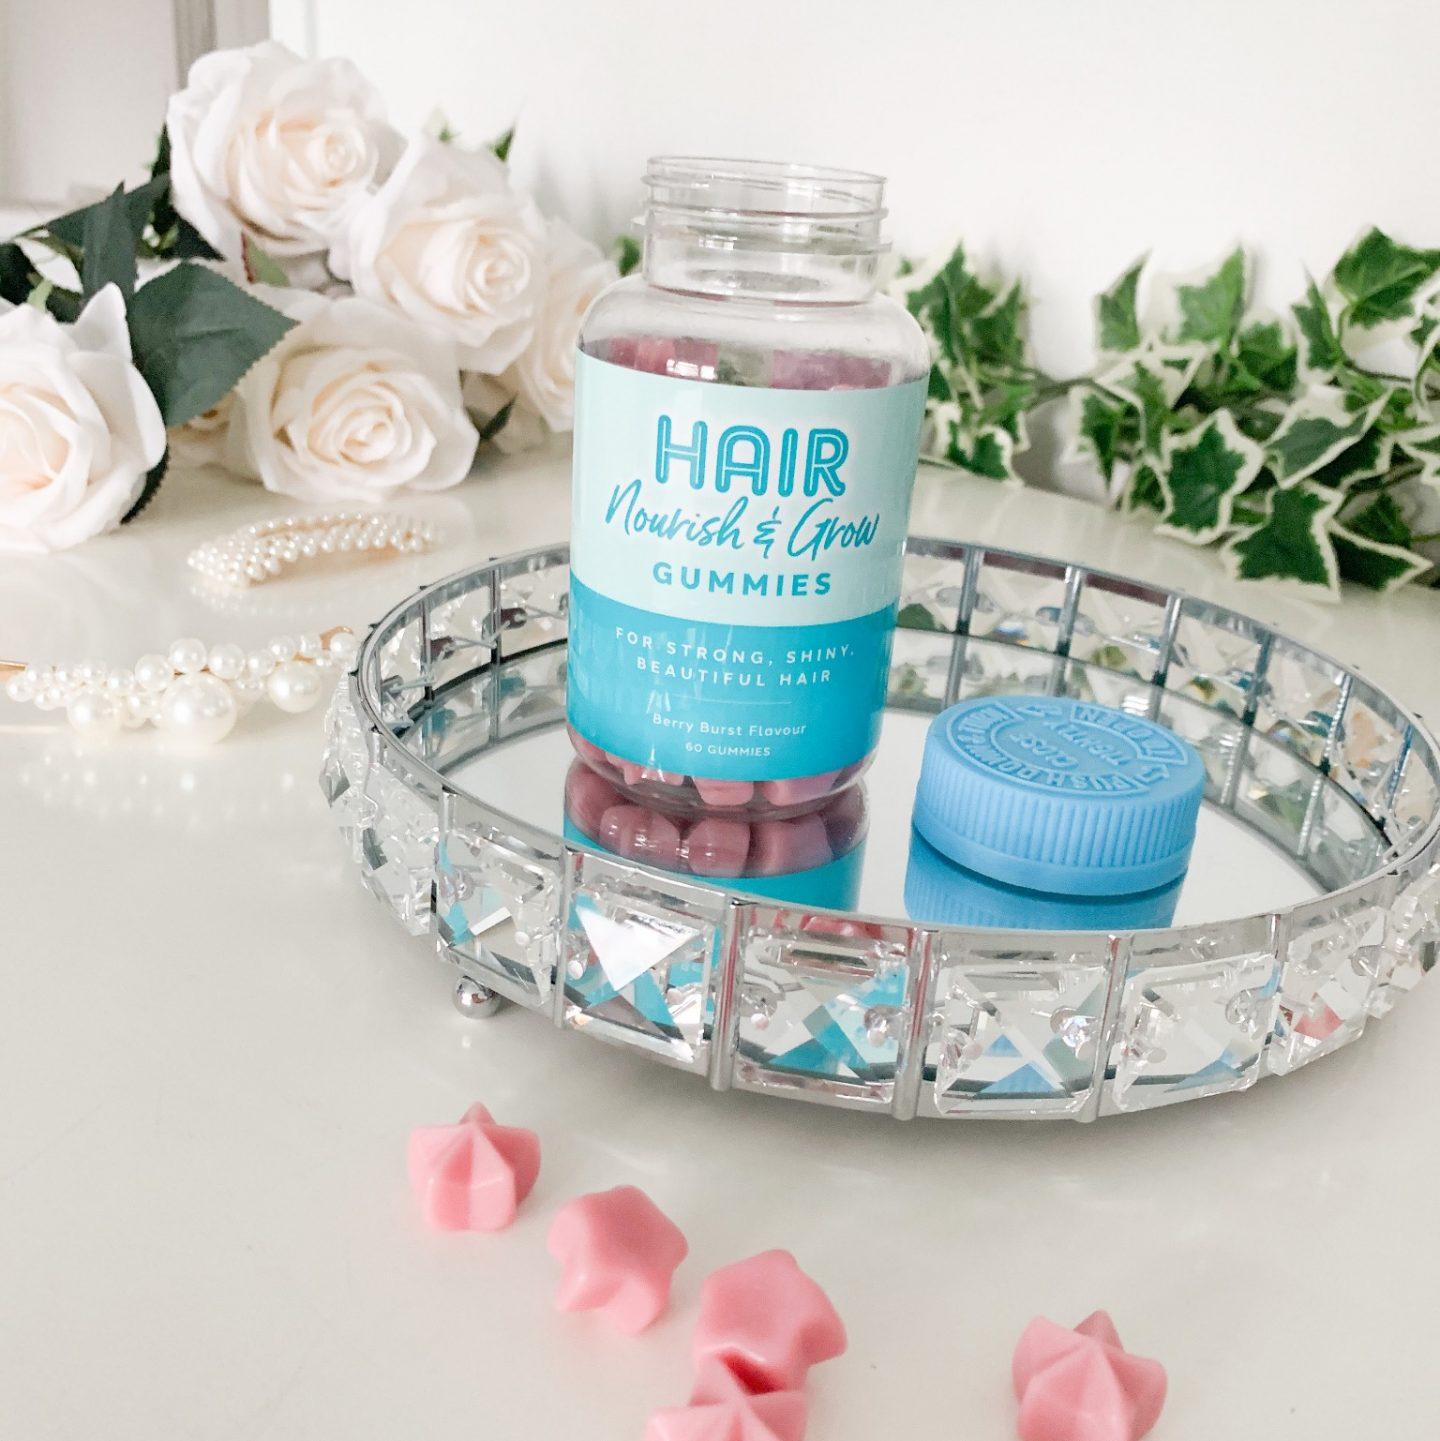 an open tub of Aldi hair nourish and glow gummies